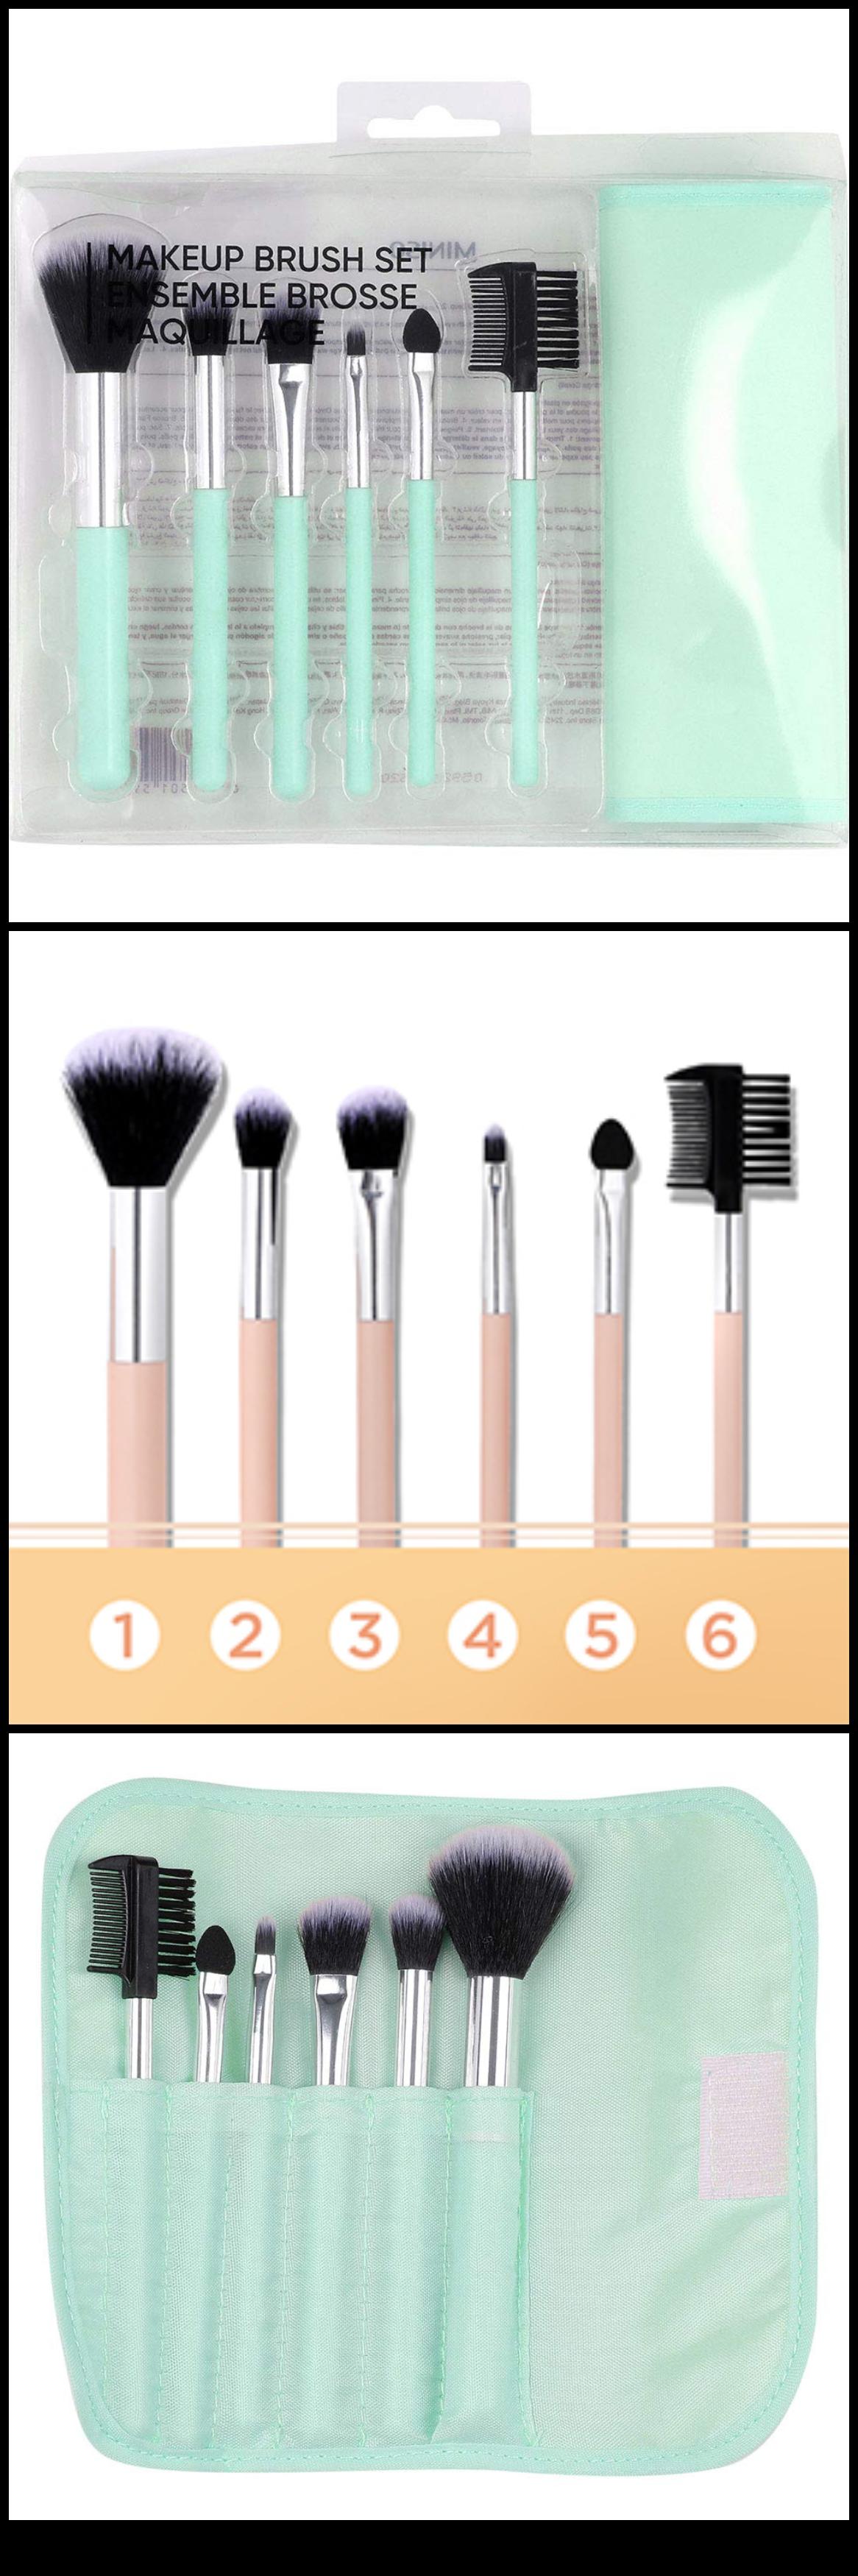 Miniso Makeup Brush Set 7pcs Foundation Brush Set For Face Makeup Pale Turquoise Eye Makeup Application Makeup Brush Set Professional Makeup Artist